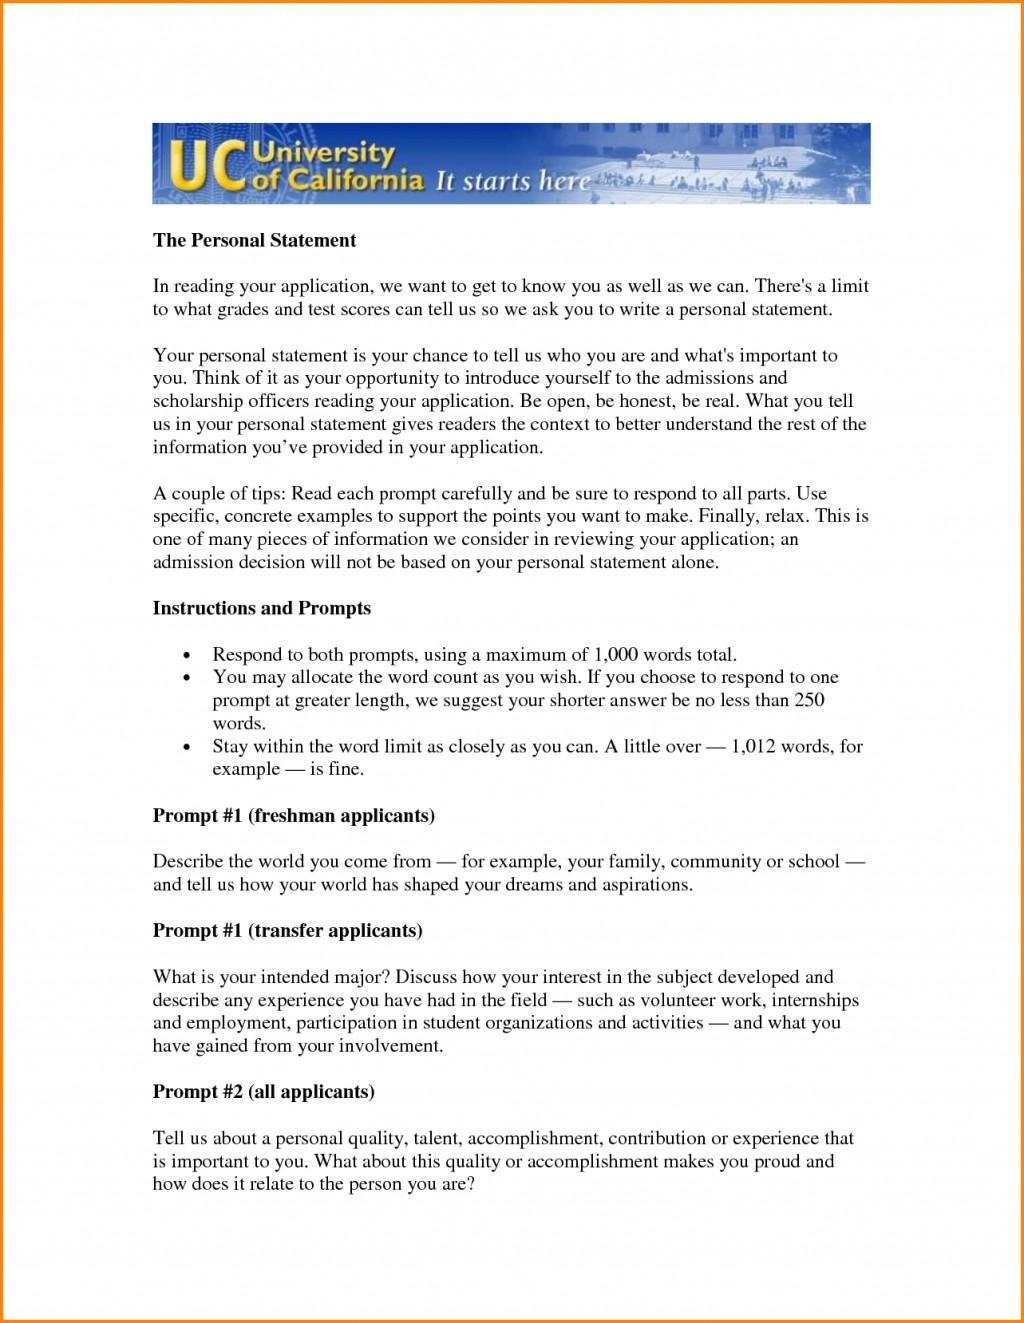 016 Uc Essay Prompt Application Prompts Davis College Personal Statement Guy Berkeleys Imposing 2015 2016-17 Examples Berkeley Large